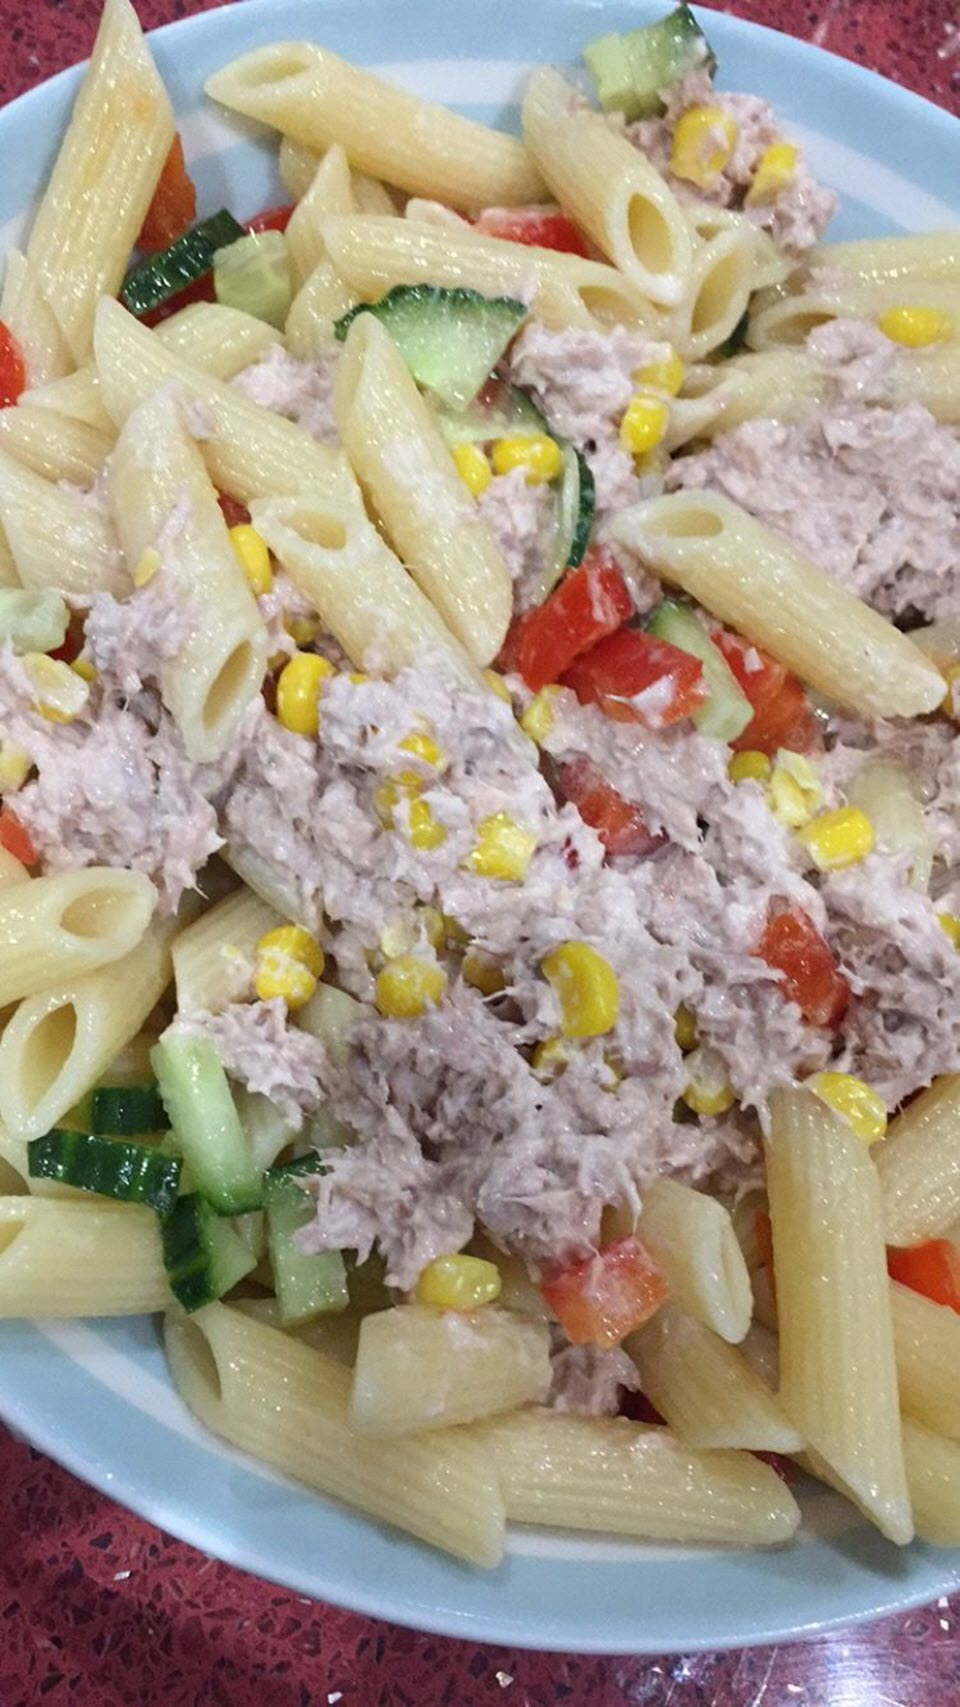 Tuna Pasta Salad with Egg